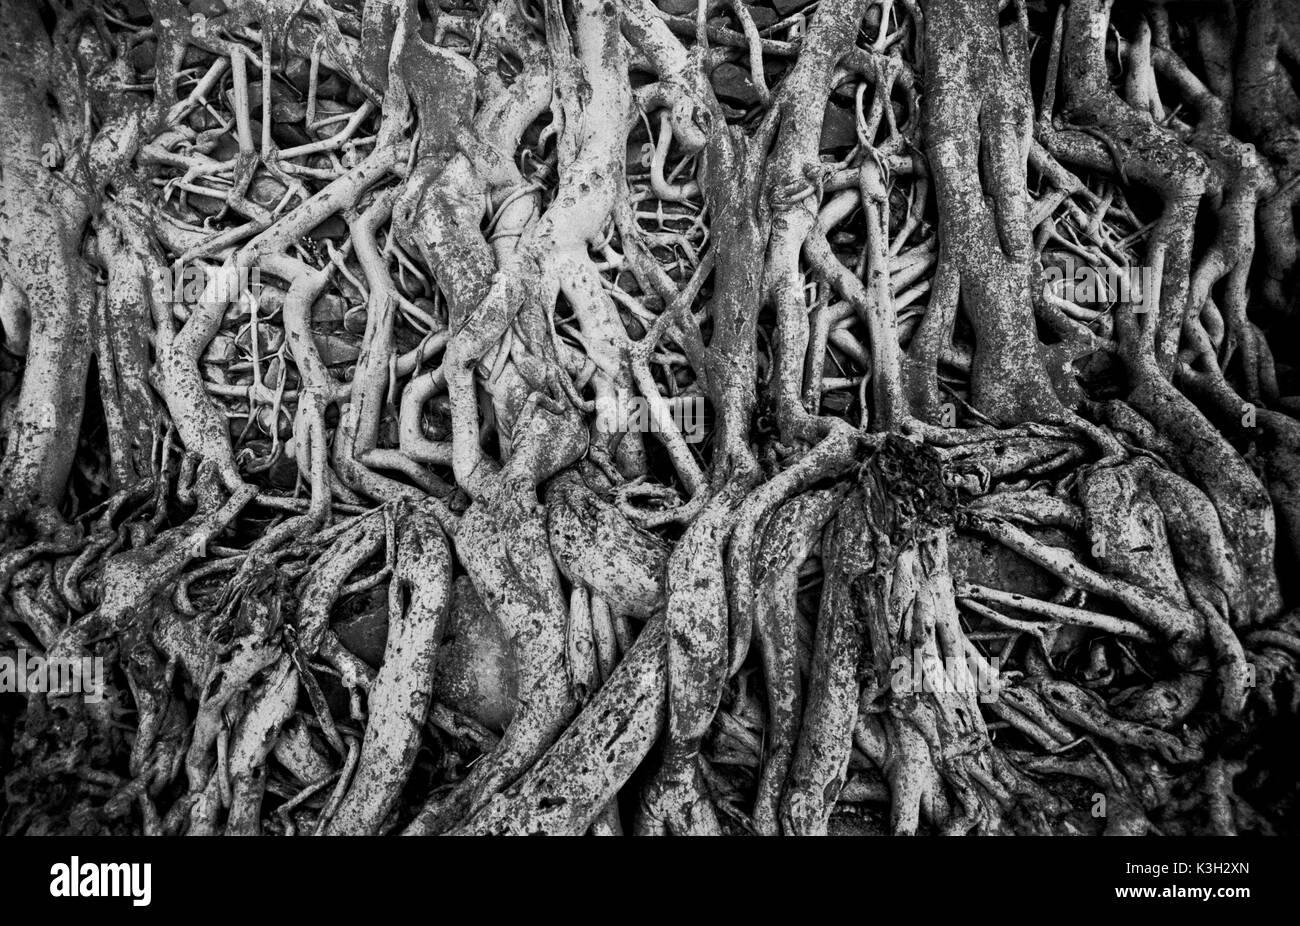 Gondar, Fasiladas' Bath. Tree roots strangle an old wall surrounding Fasilidas' Bath in Gondar, Ethiopia, - Stock Image